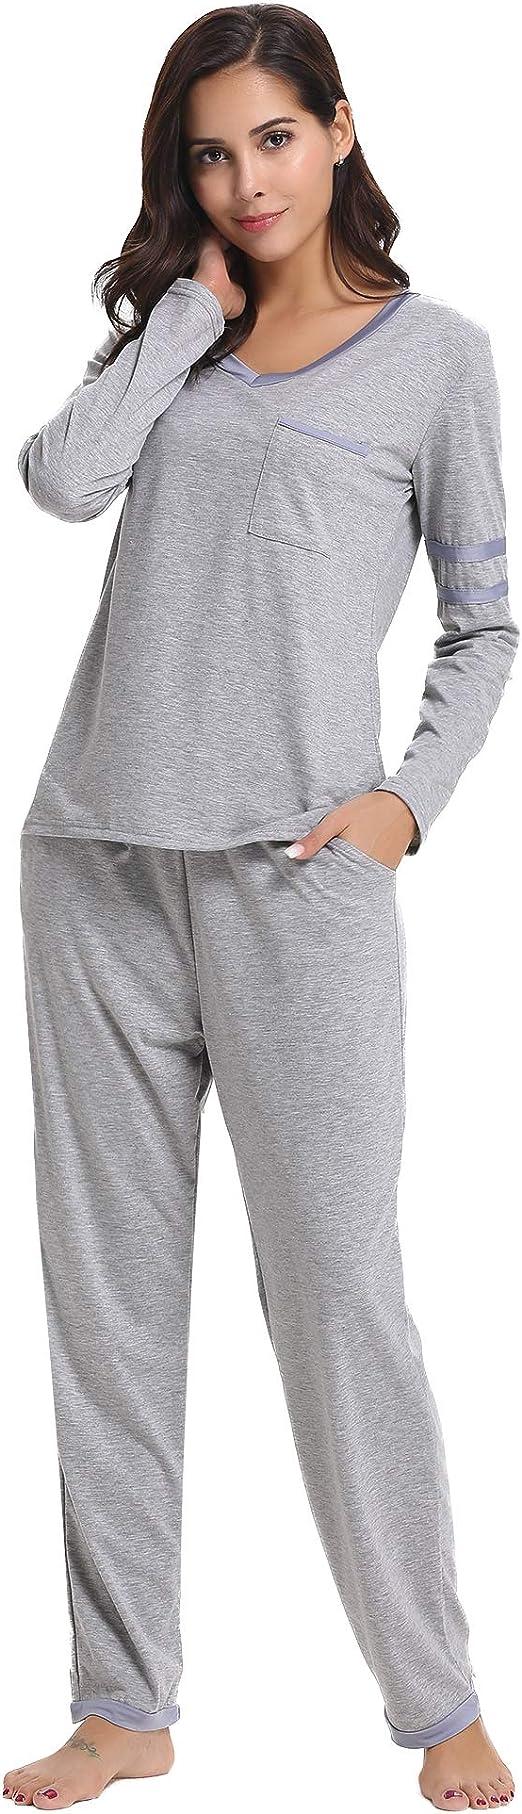 Hawiton Pijama Mujer de Algodón Invierno Otoño Mangas Larga Ropa de Domir 2 Piezas Pantalones Largo